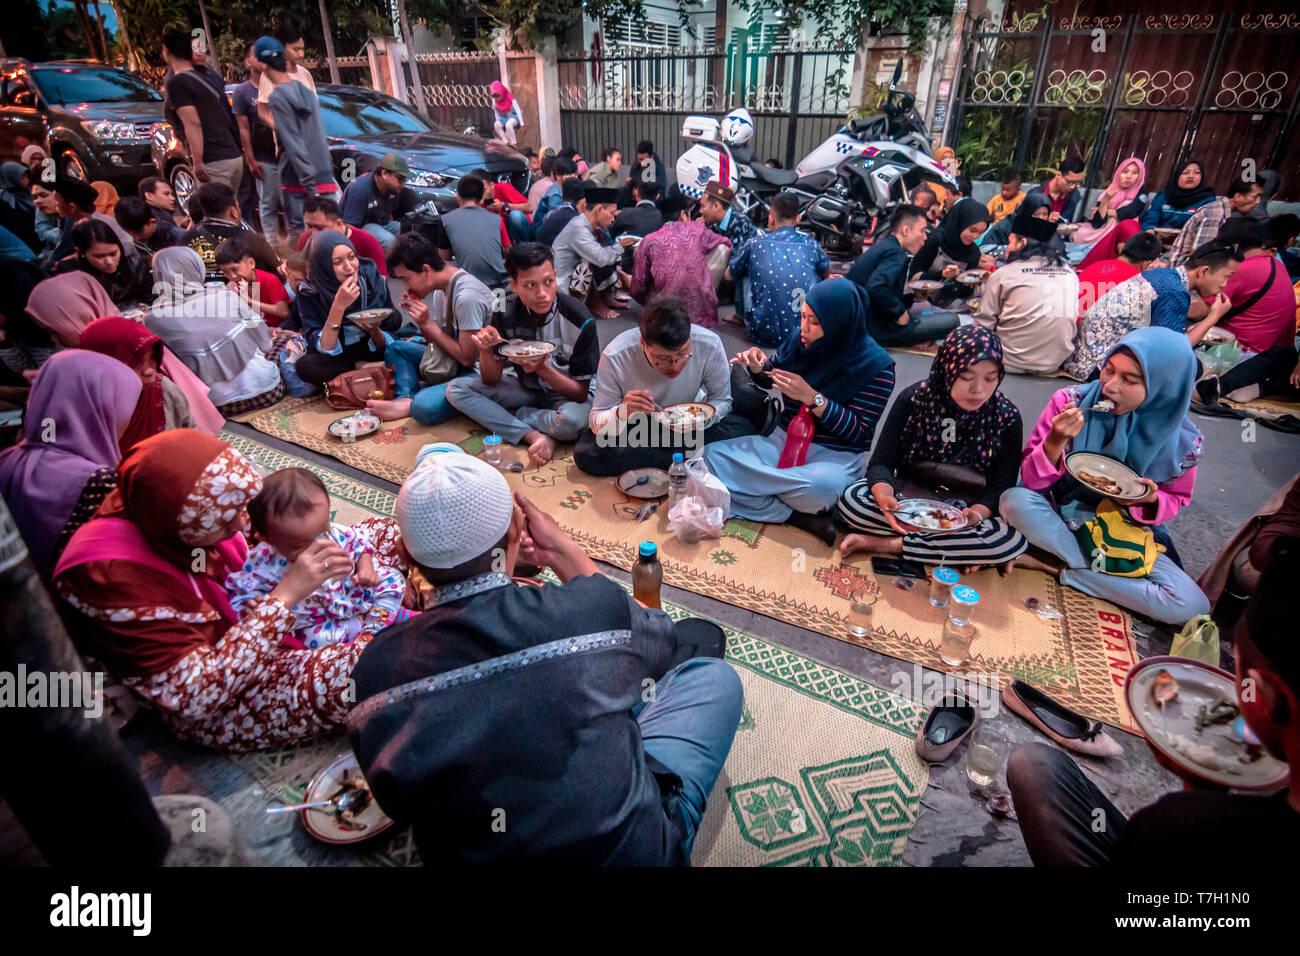 bengalese velocità musulmana dating Londra